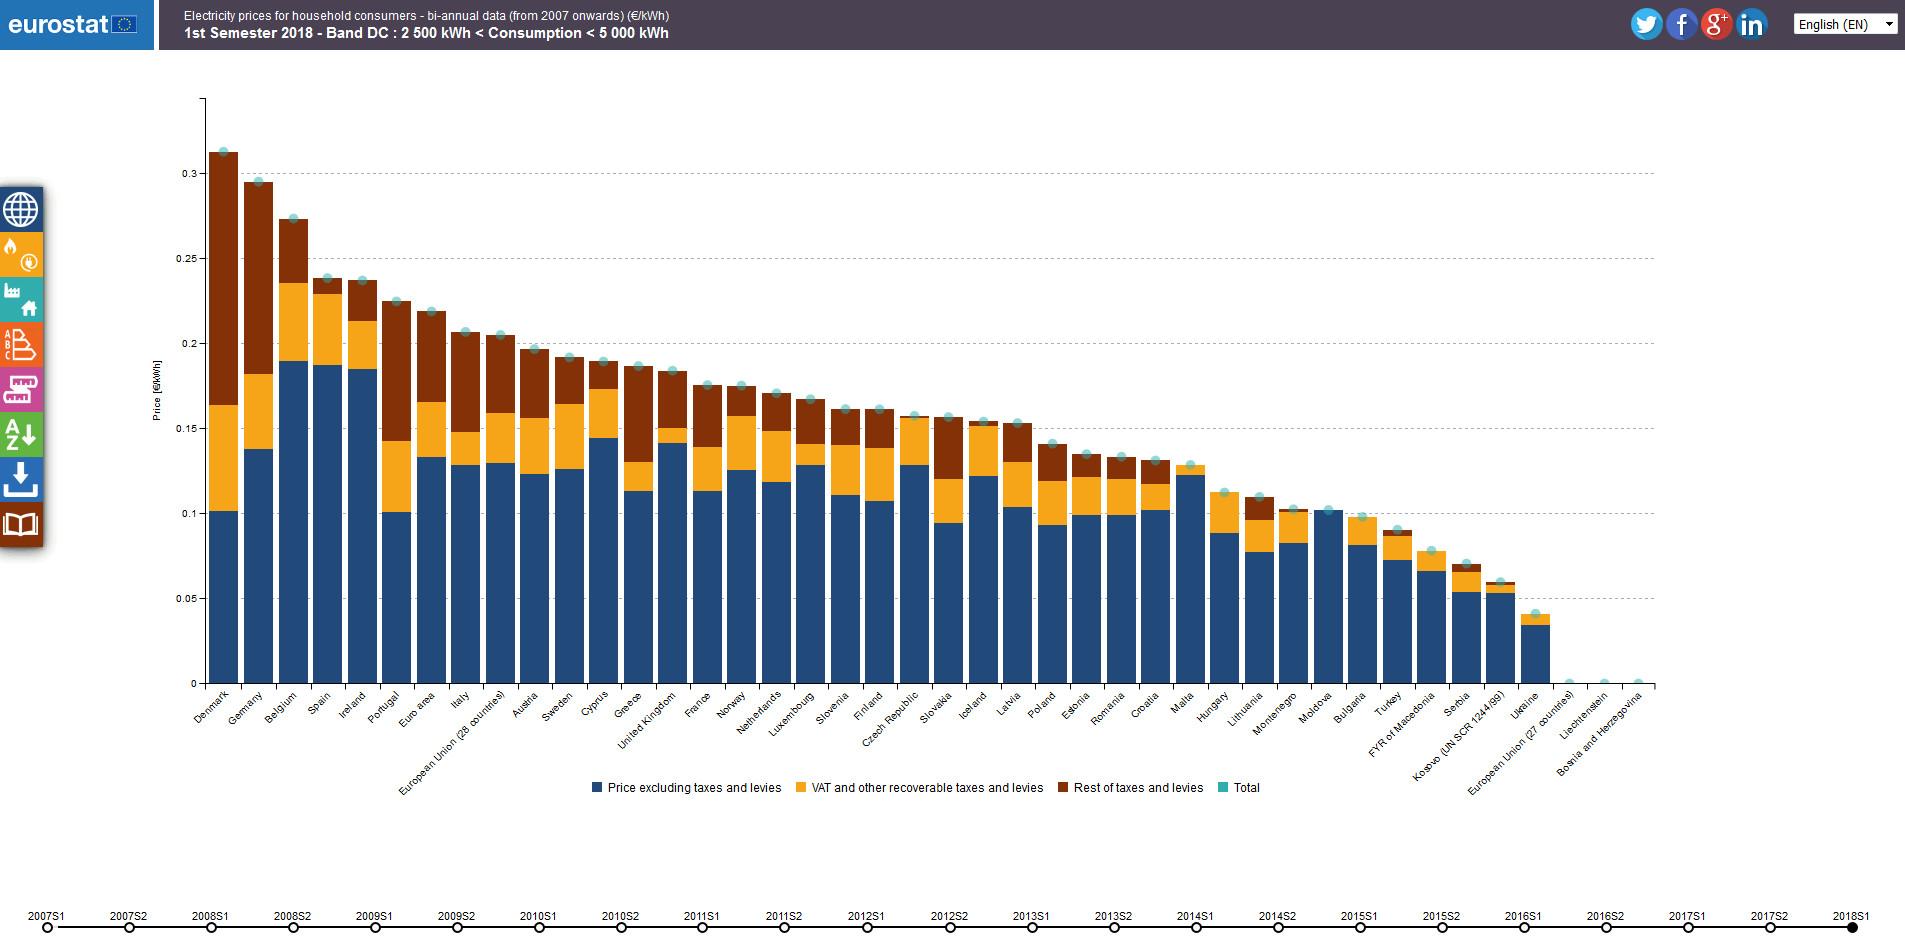 Visualisation: Energy prices